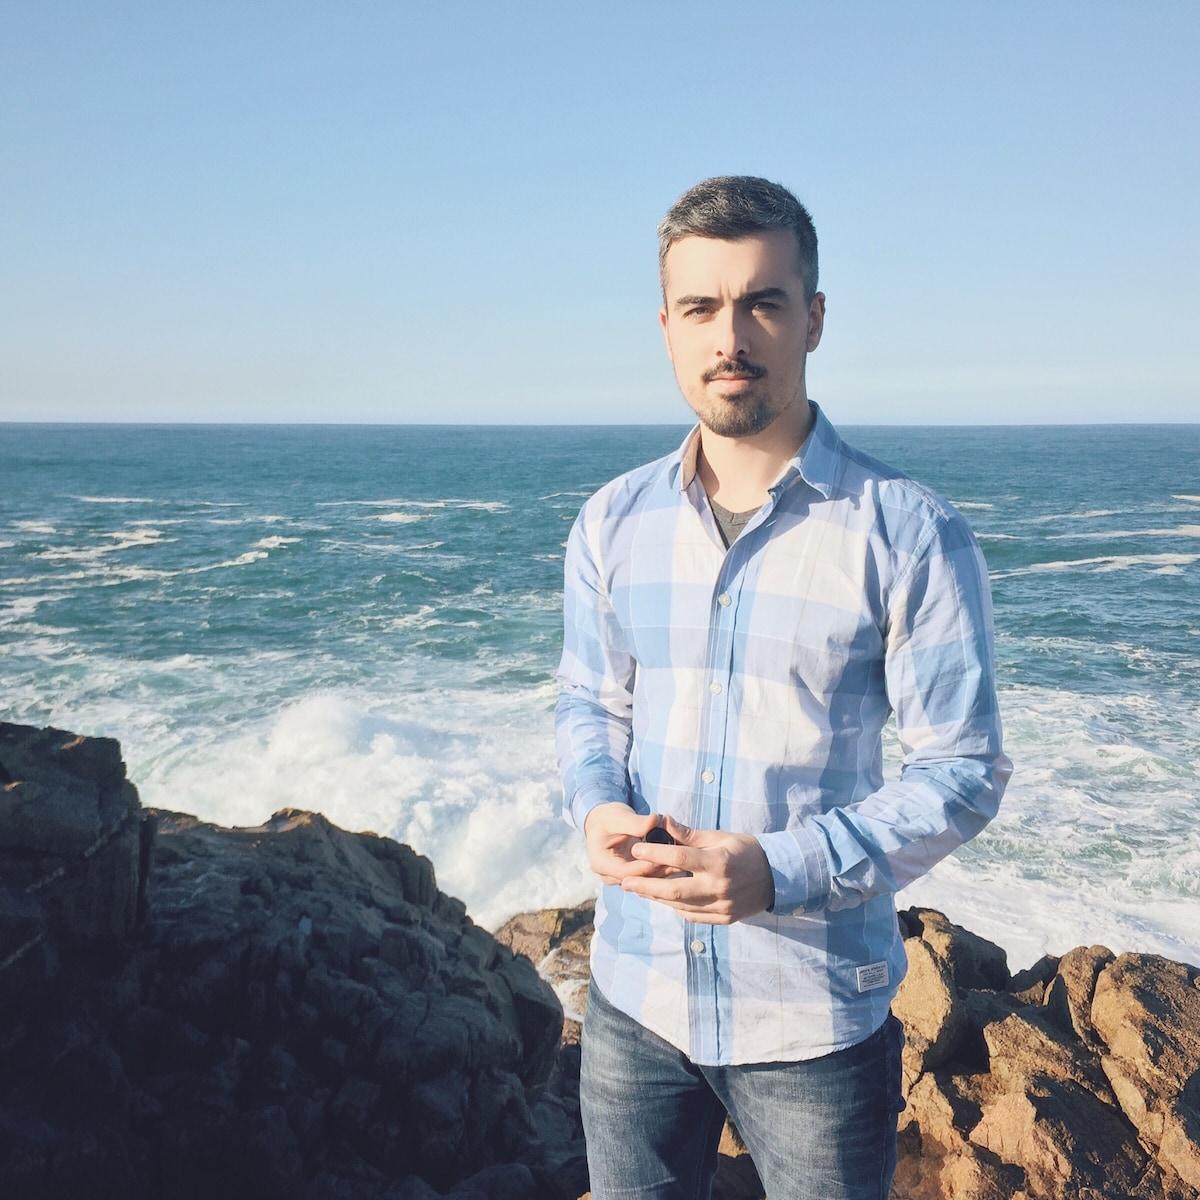 Daniel from Santiago de Compostela